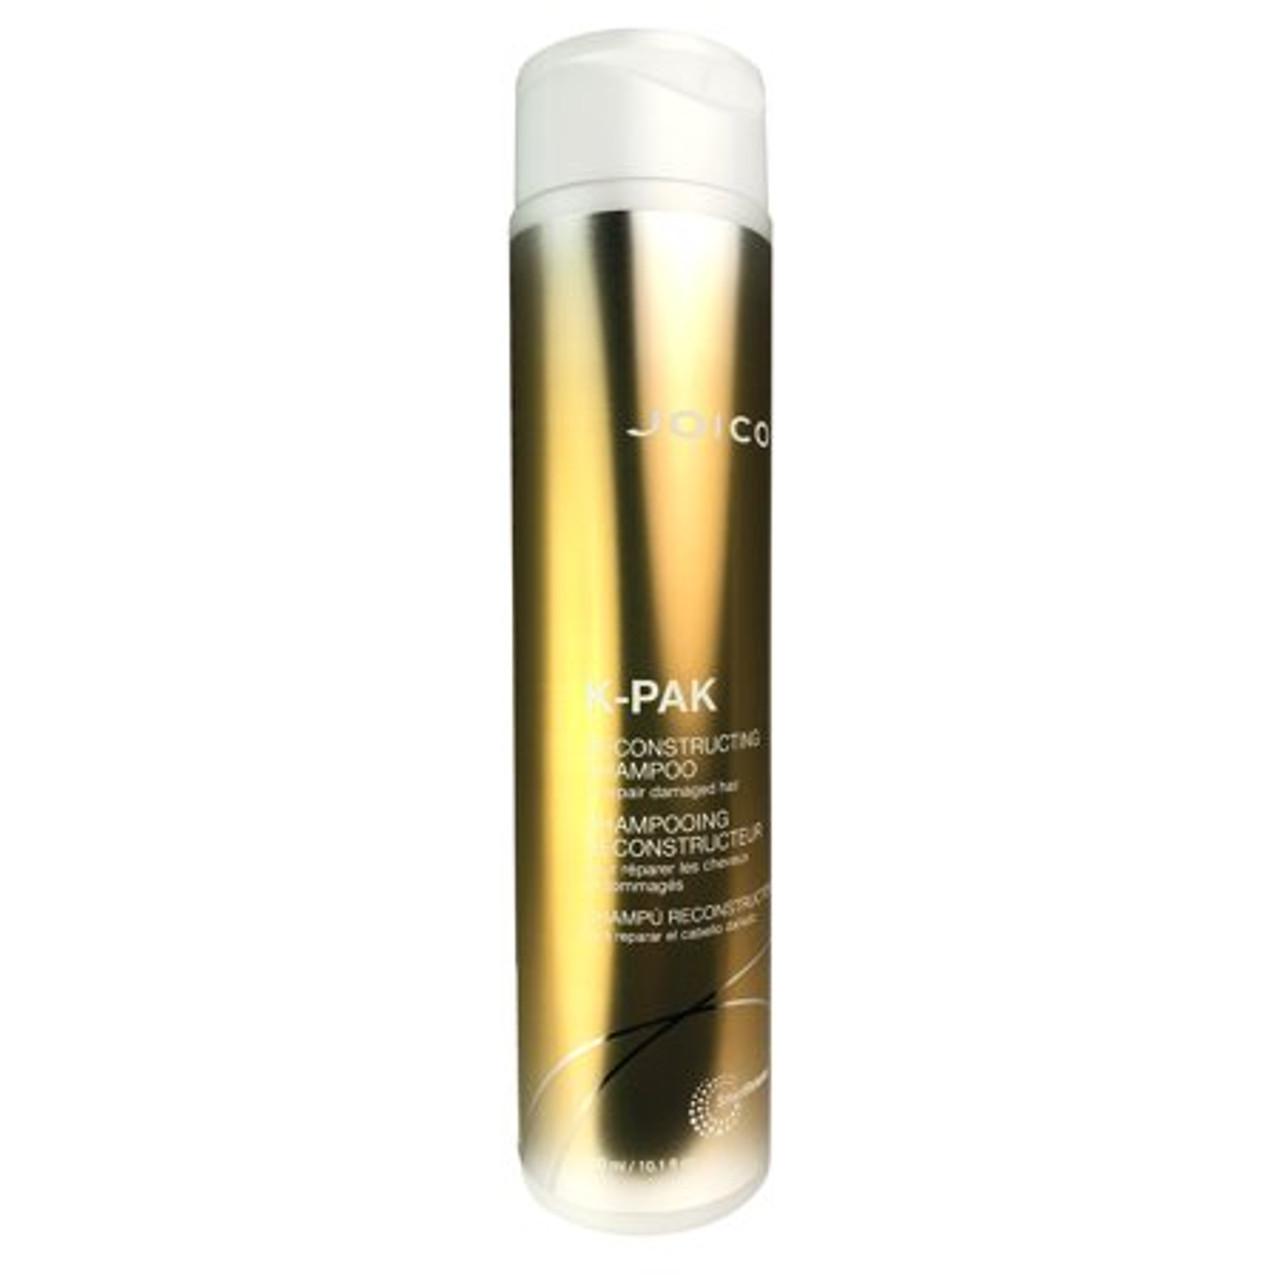 Joico K-PAK Reconstructing Shampoo for Damaged Hair 10.1 Ounce  Reconstructing shampoo's rich lather gently cleanses damaged hair.